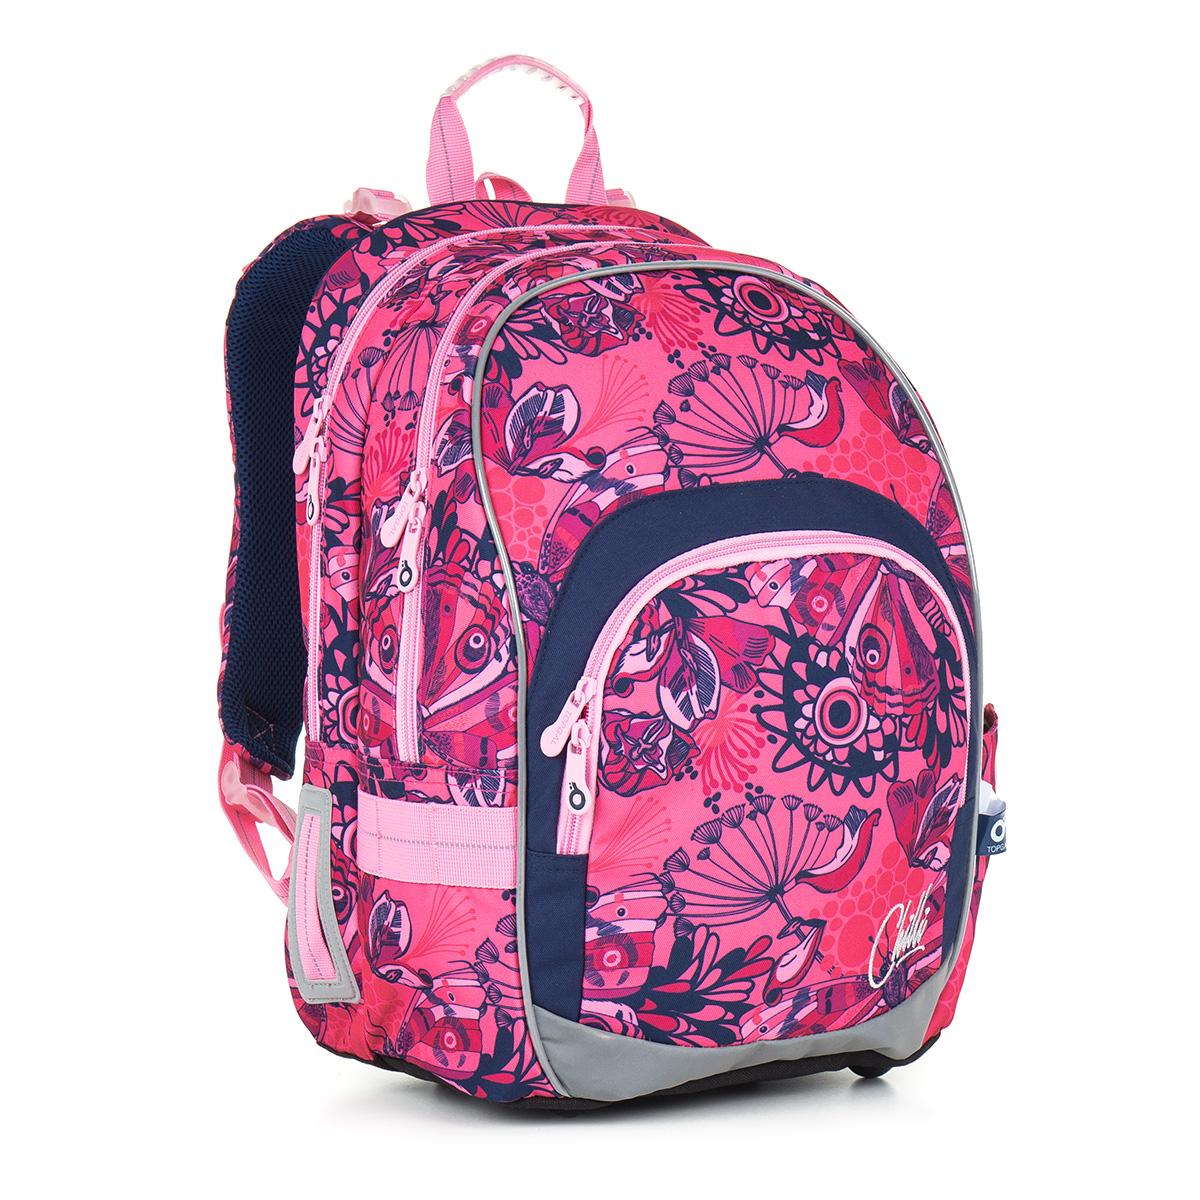 Topgal školní batoh CHI 871 H - Pink